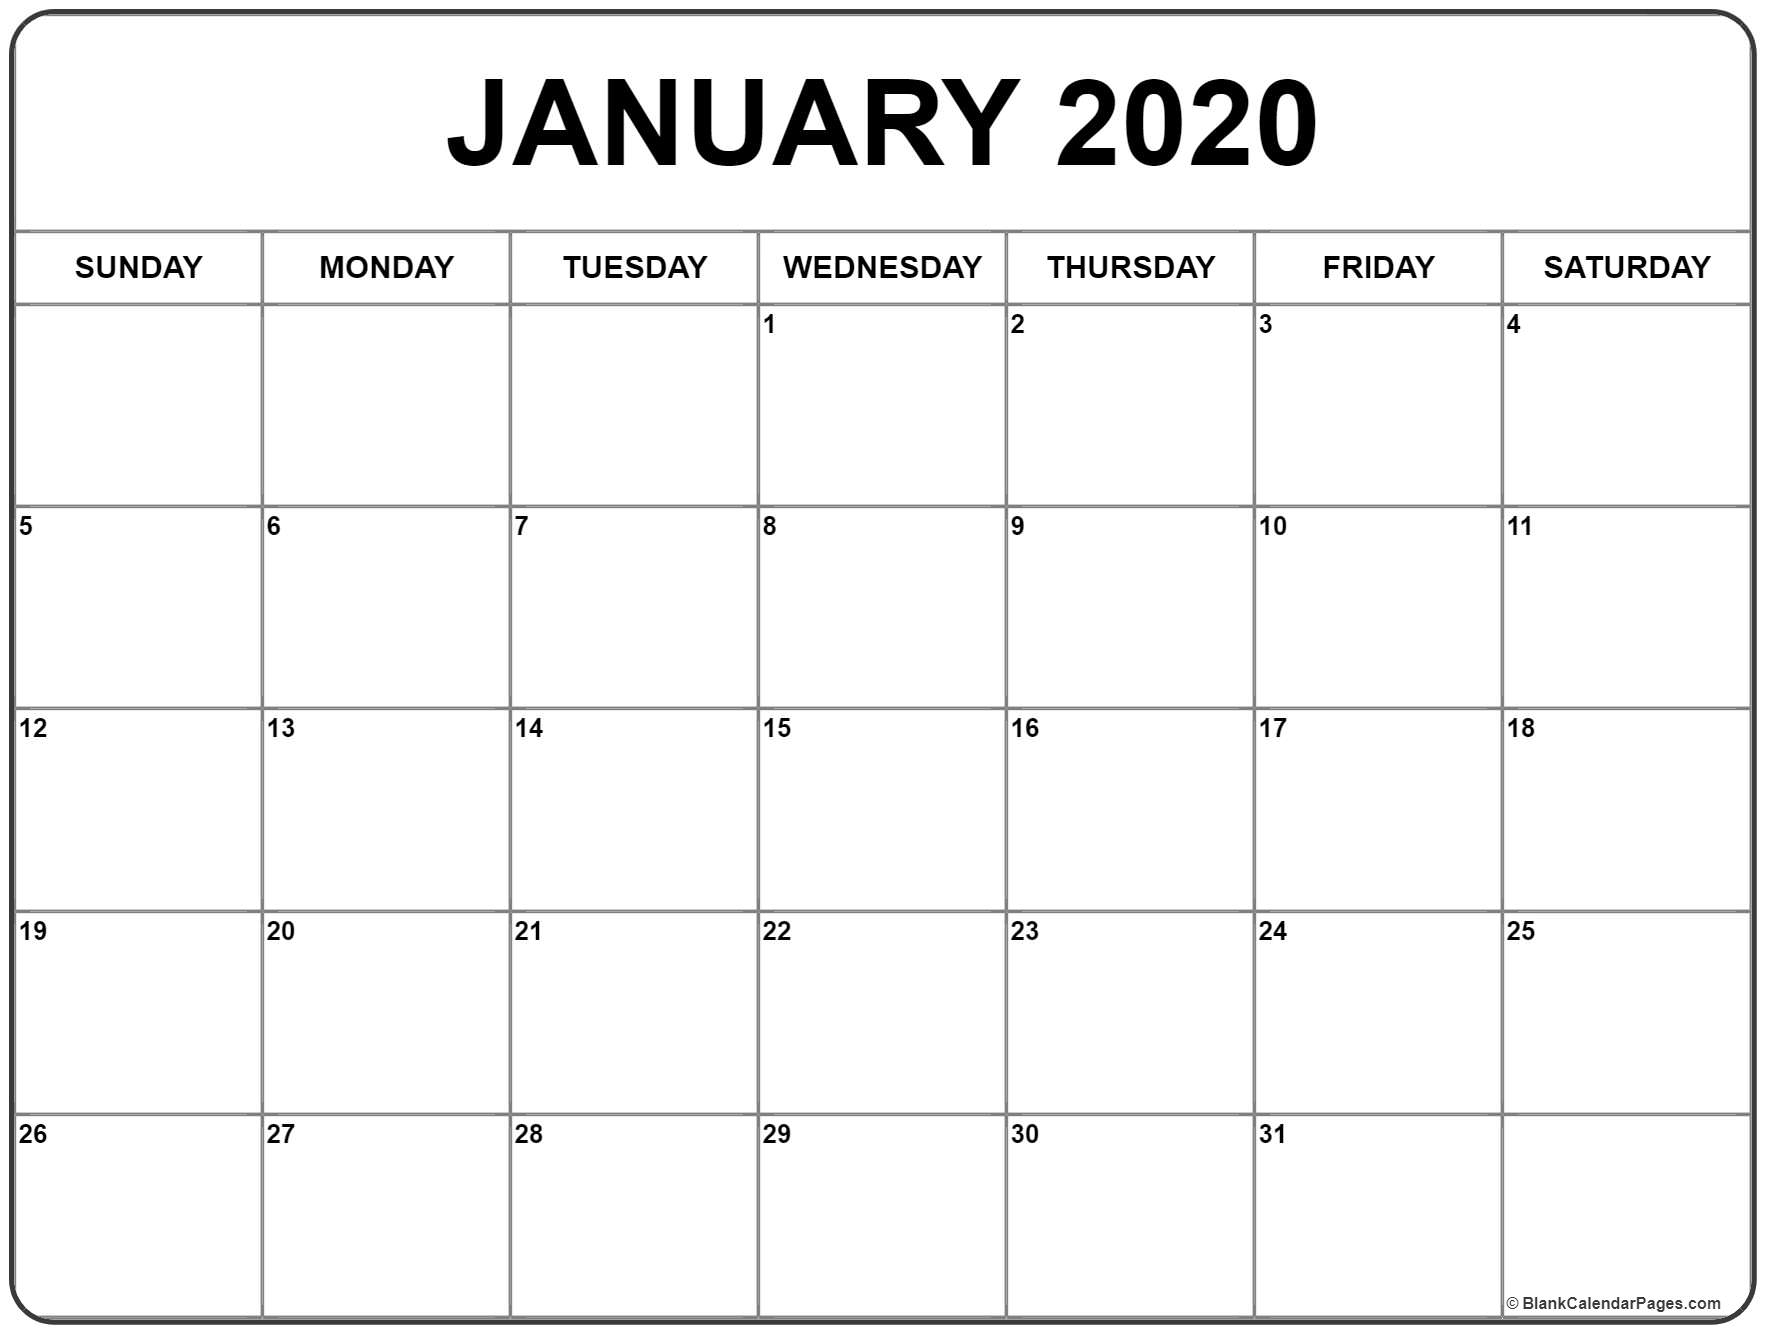 January 2020 Calendar | Free Printable Monthly Calendars in 2020 Printable Calender Imom